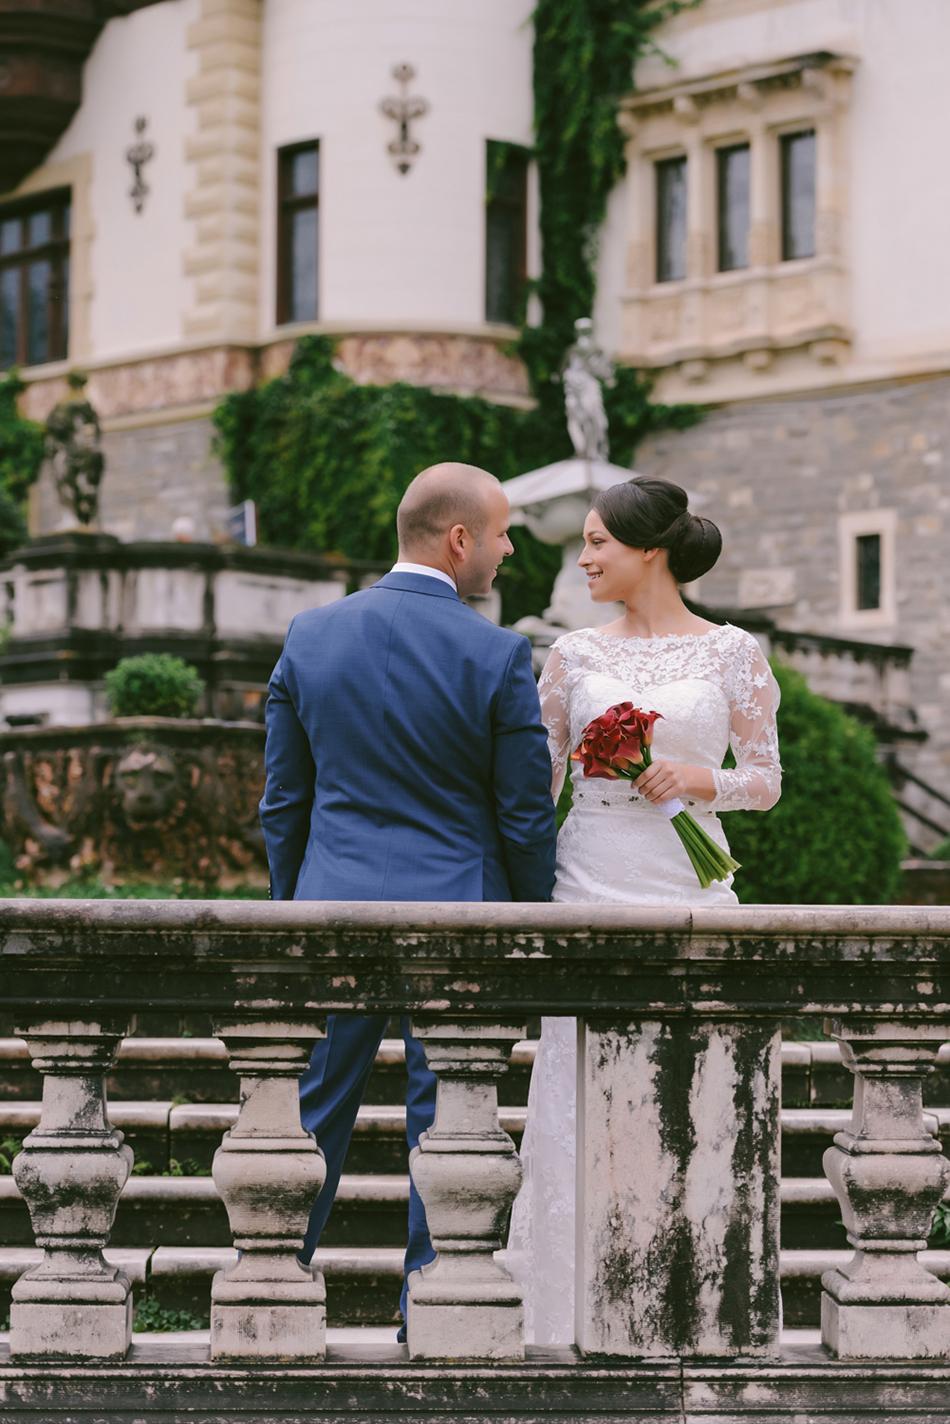 AD Passion Photography | fotograf-nunta-sinaia-flo-oana_0145 | Adelin, Dida, fotograf profesionist, fotograf de nunta, fotografie de nunta, fotograf Timisoara, fotograf Craiova, fotograf Bucuresti, fotograf Arad, nunta Timisoara, nunta Arad, nunta Bucuresti, nunta Craiova